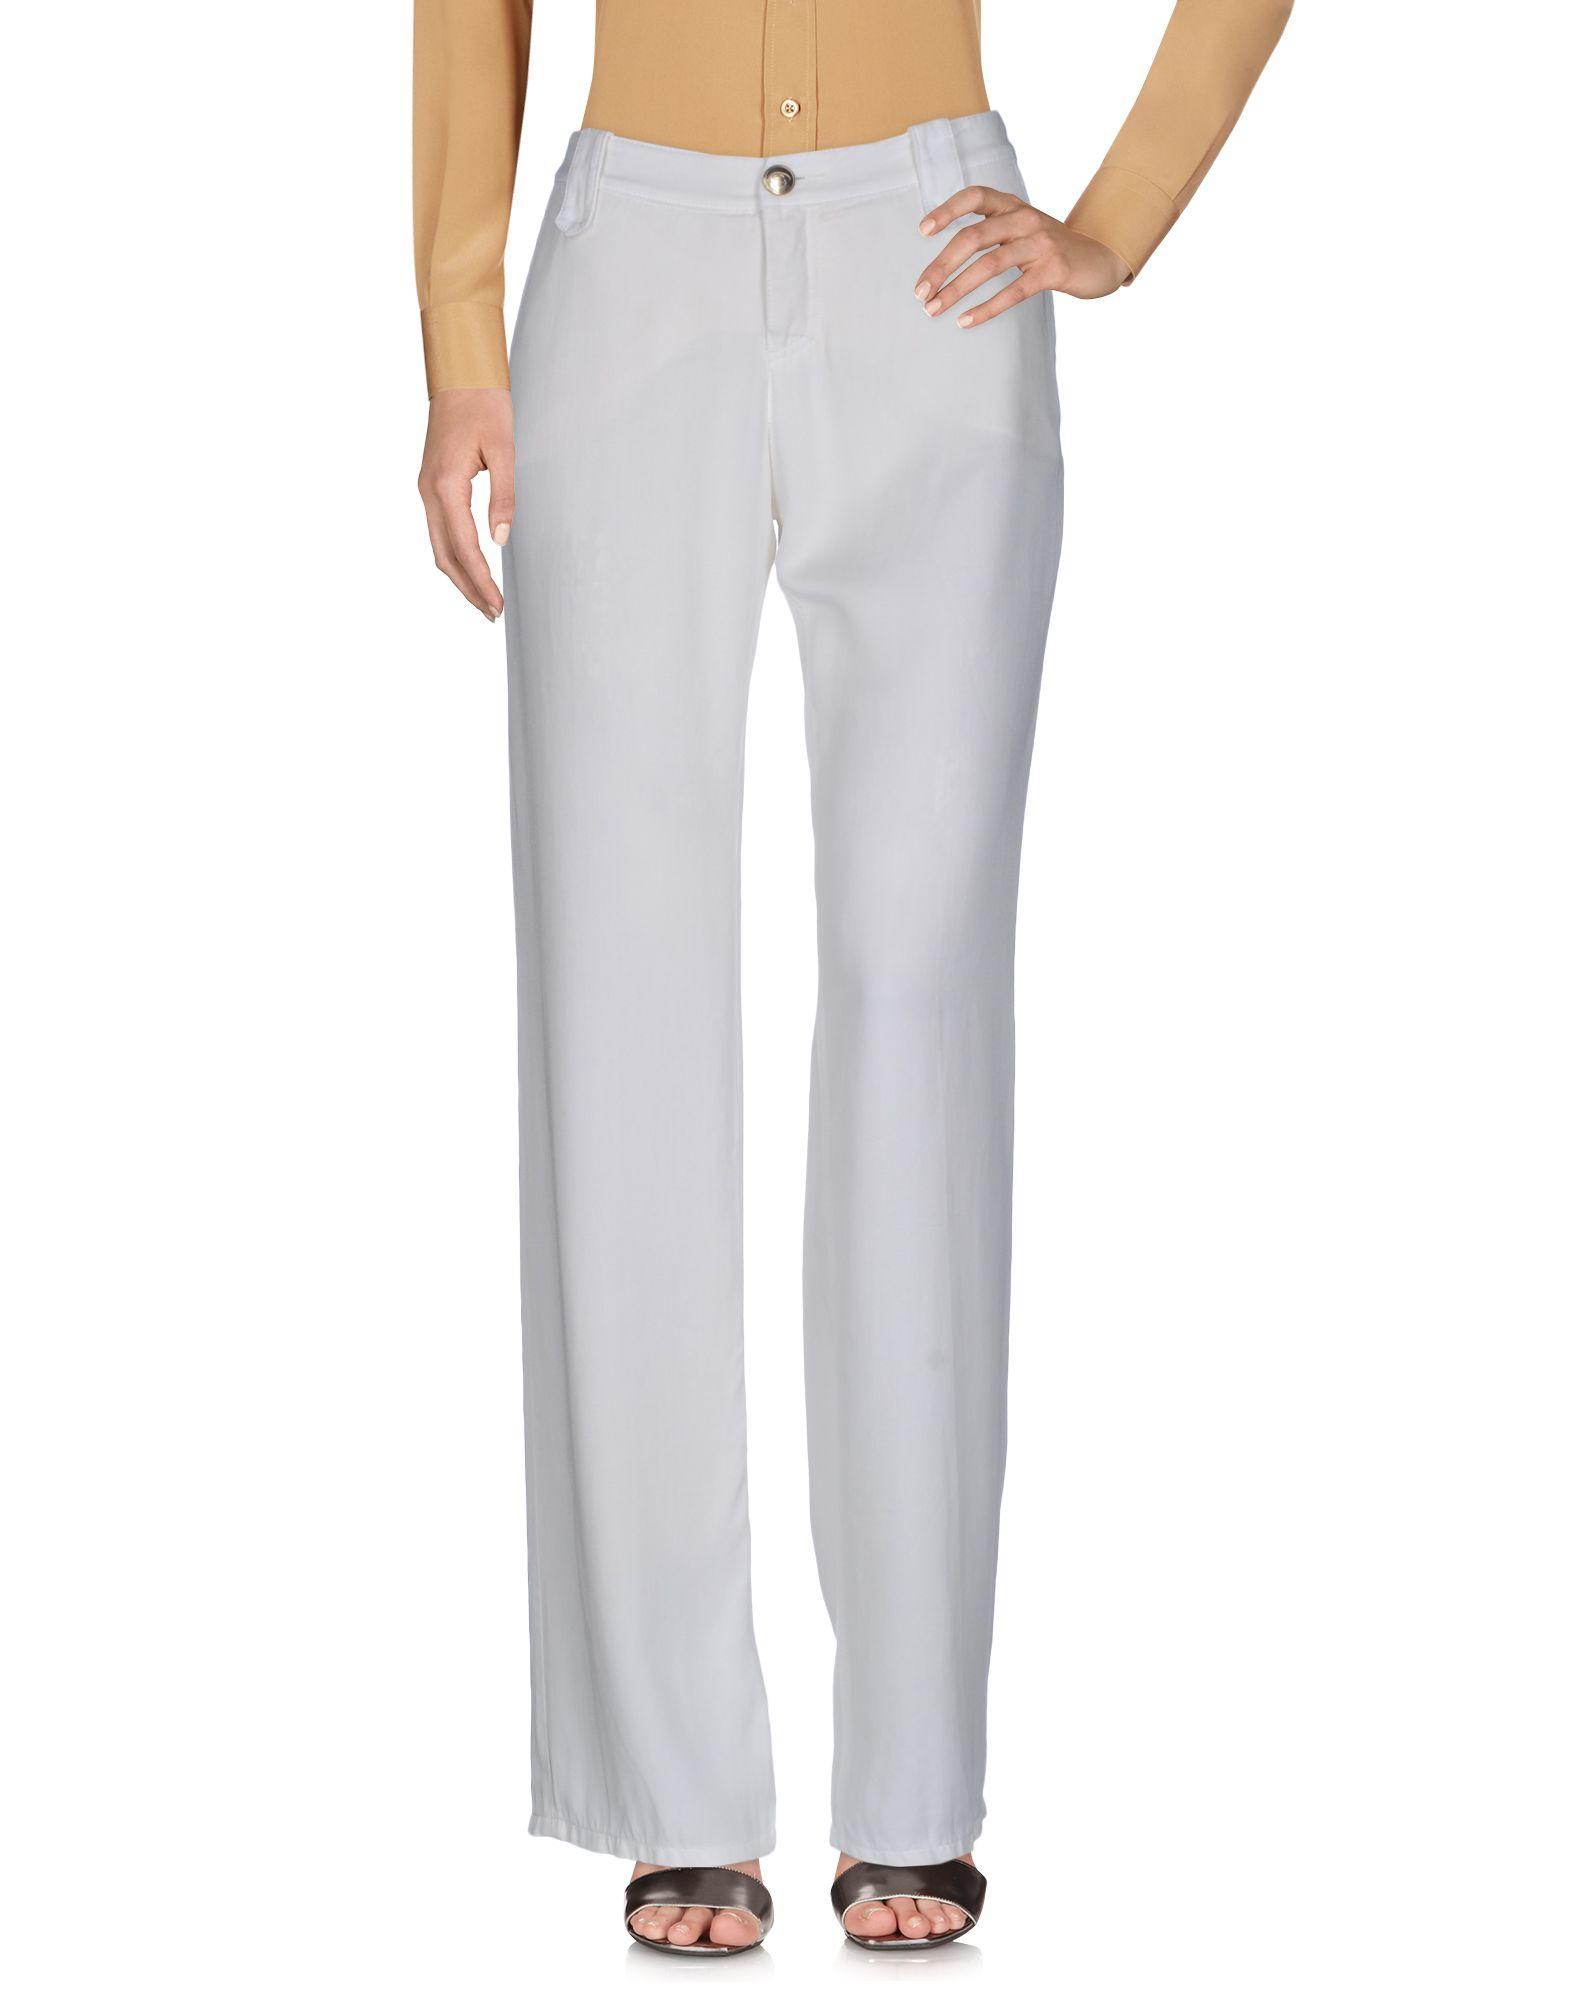 Pantalone Blumarine Donna - Acquista online su yU9zyFGh